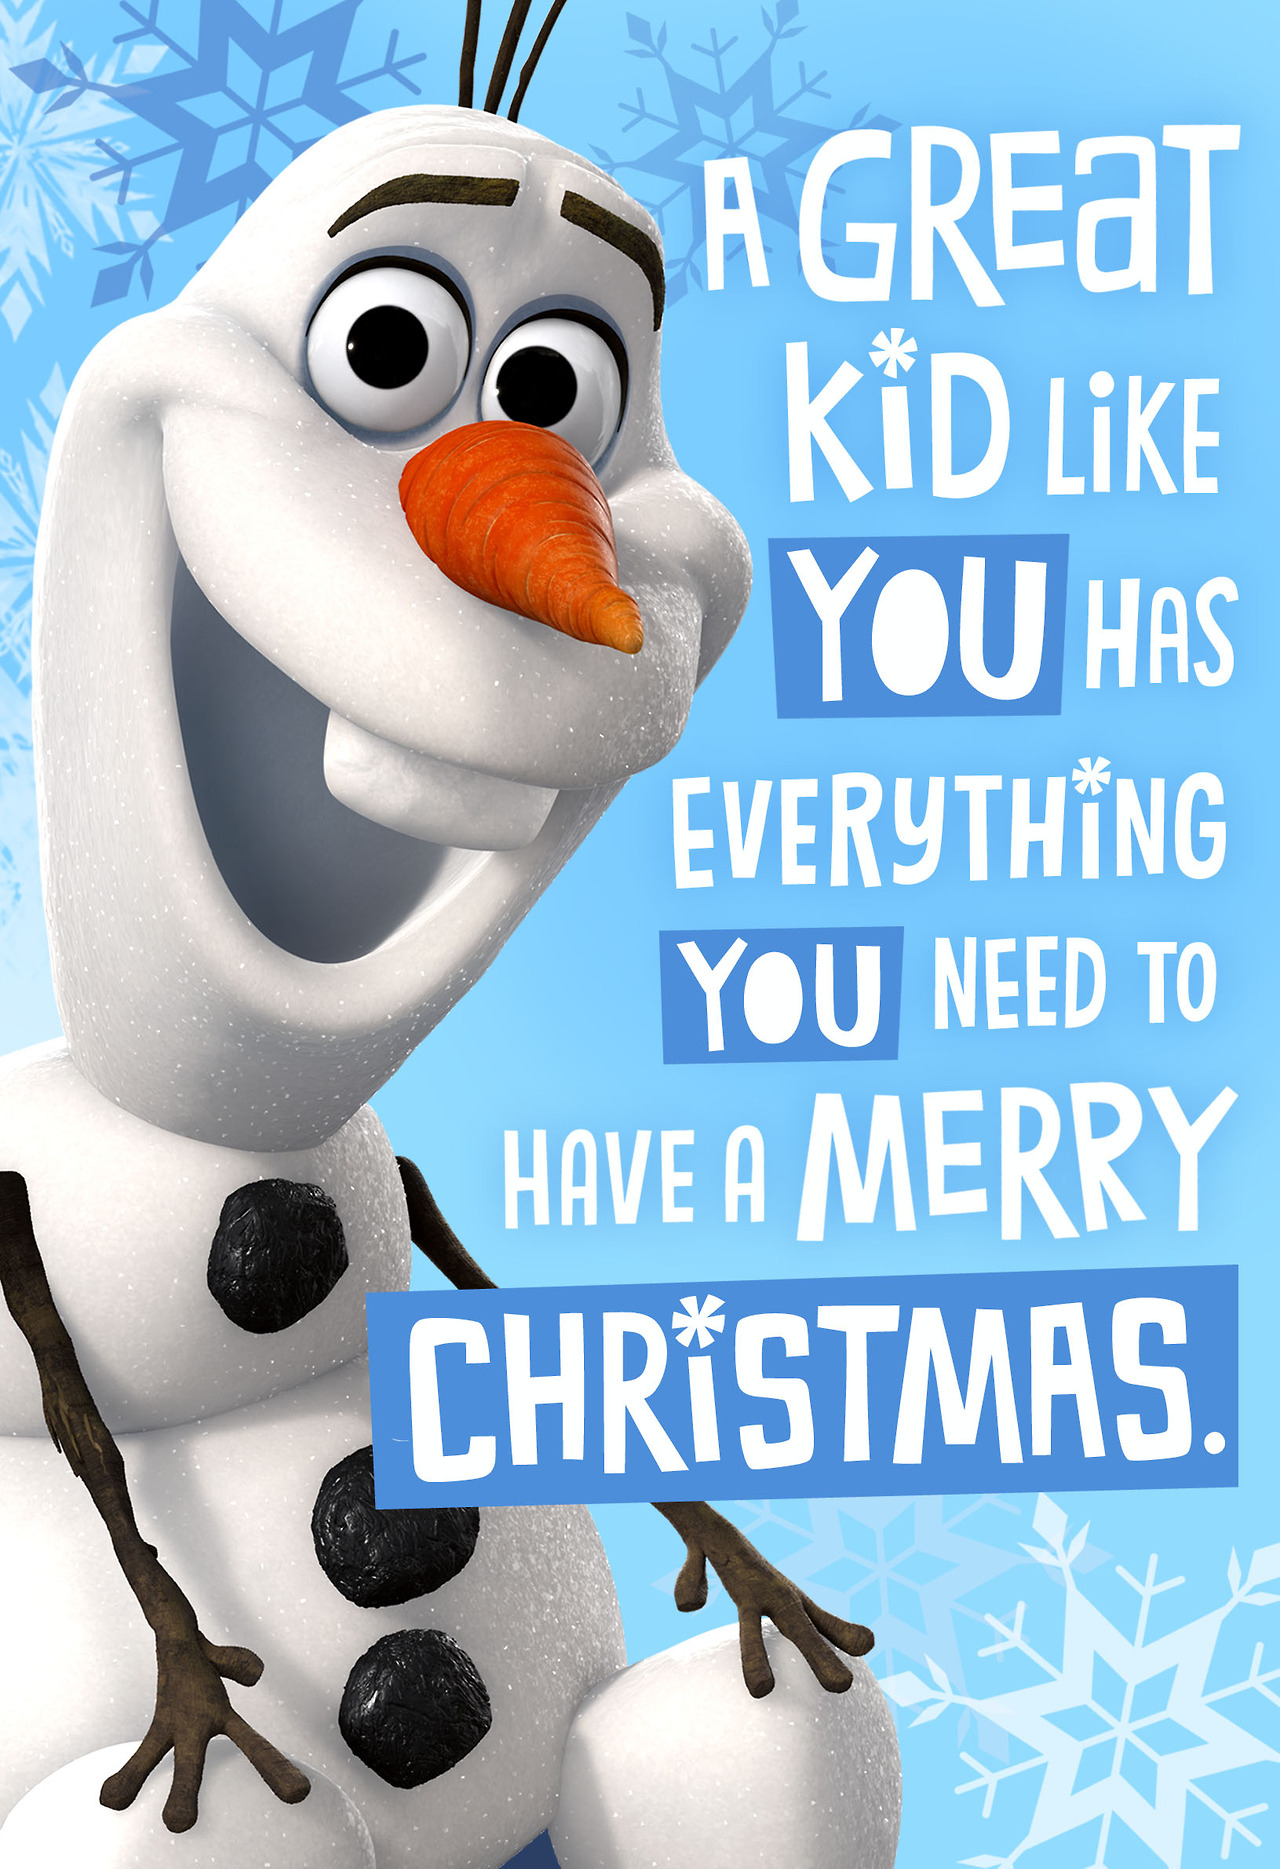 Disney Olaf Frozen Xmas Quotes QuotesGram 1280x1869